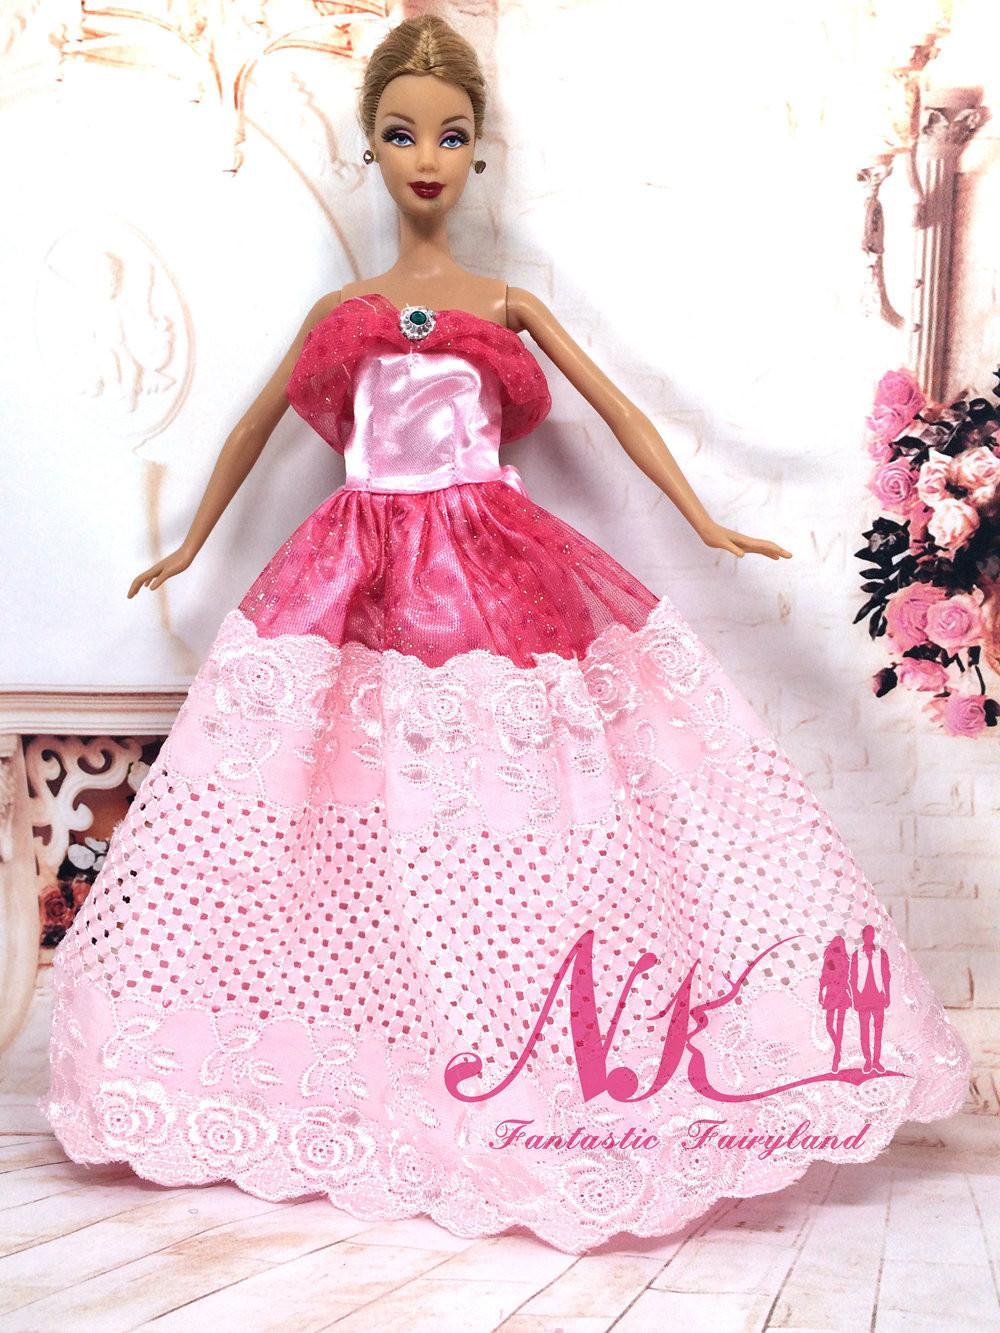 Perfecto Vendimia Vestido De Novia Inspirado Modelo - Colección de ...